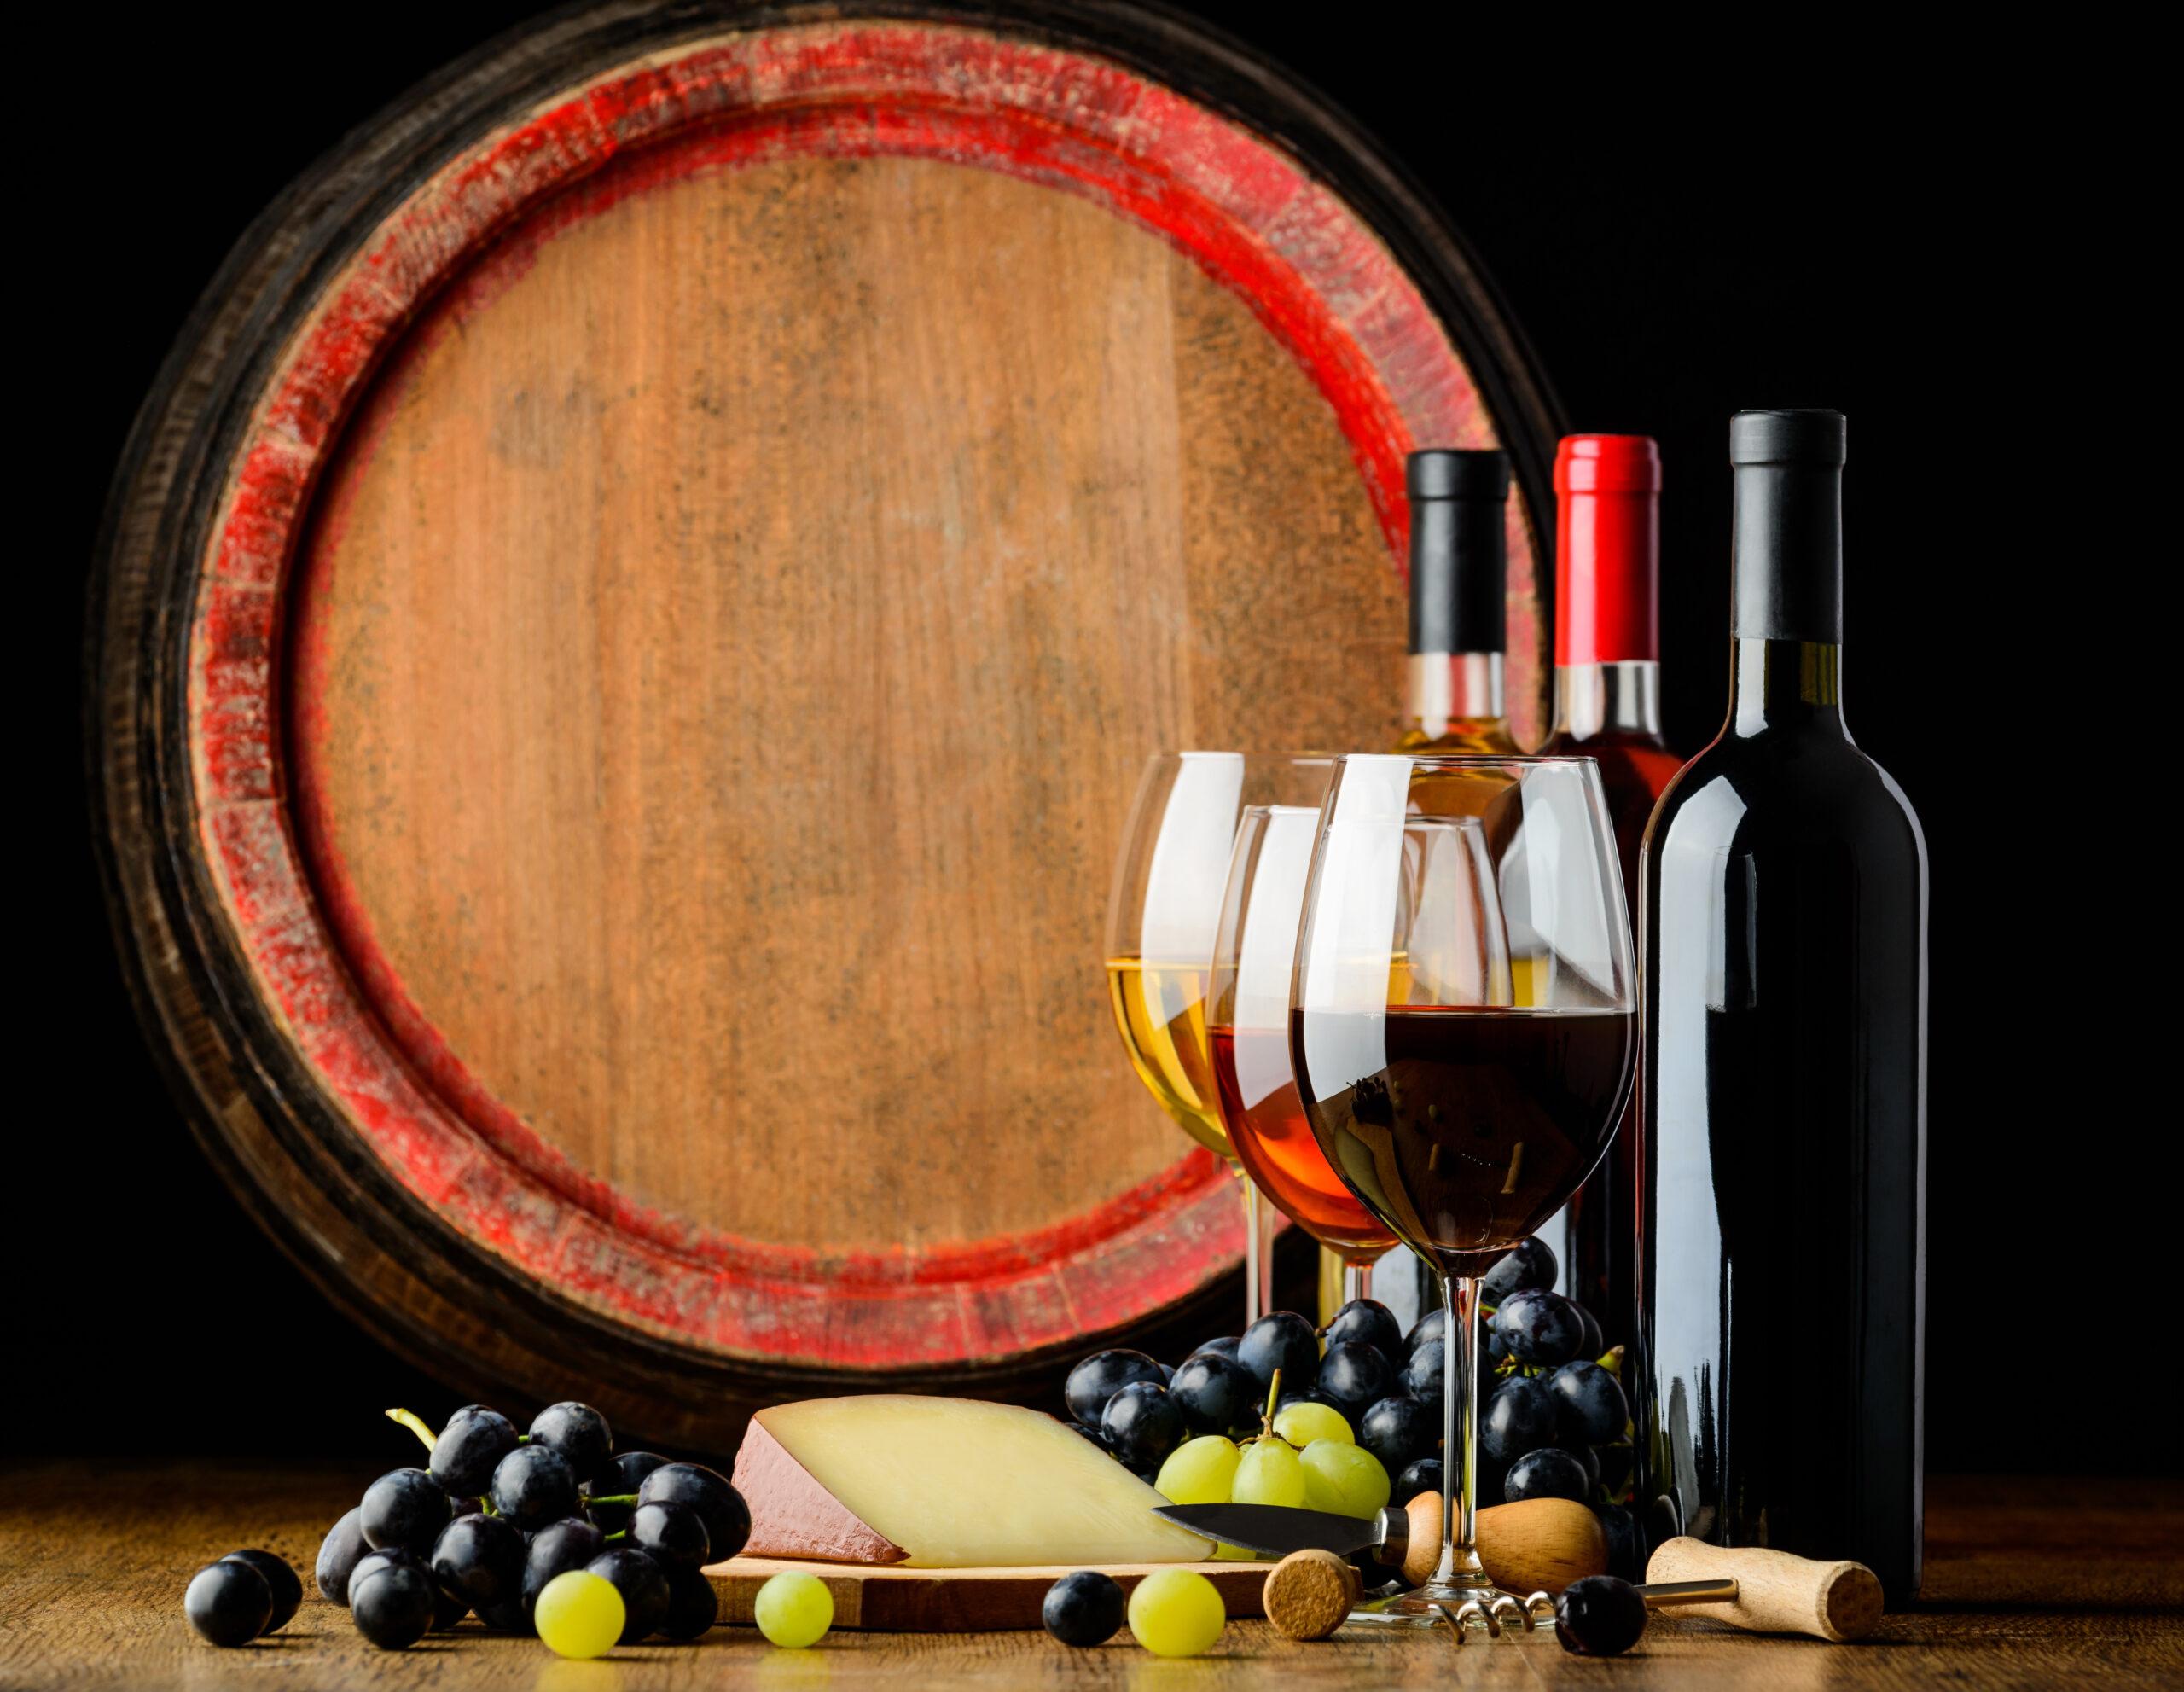 vinos tienda delicatessen